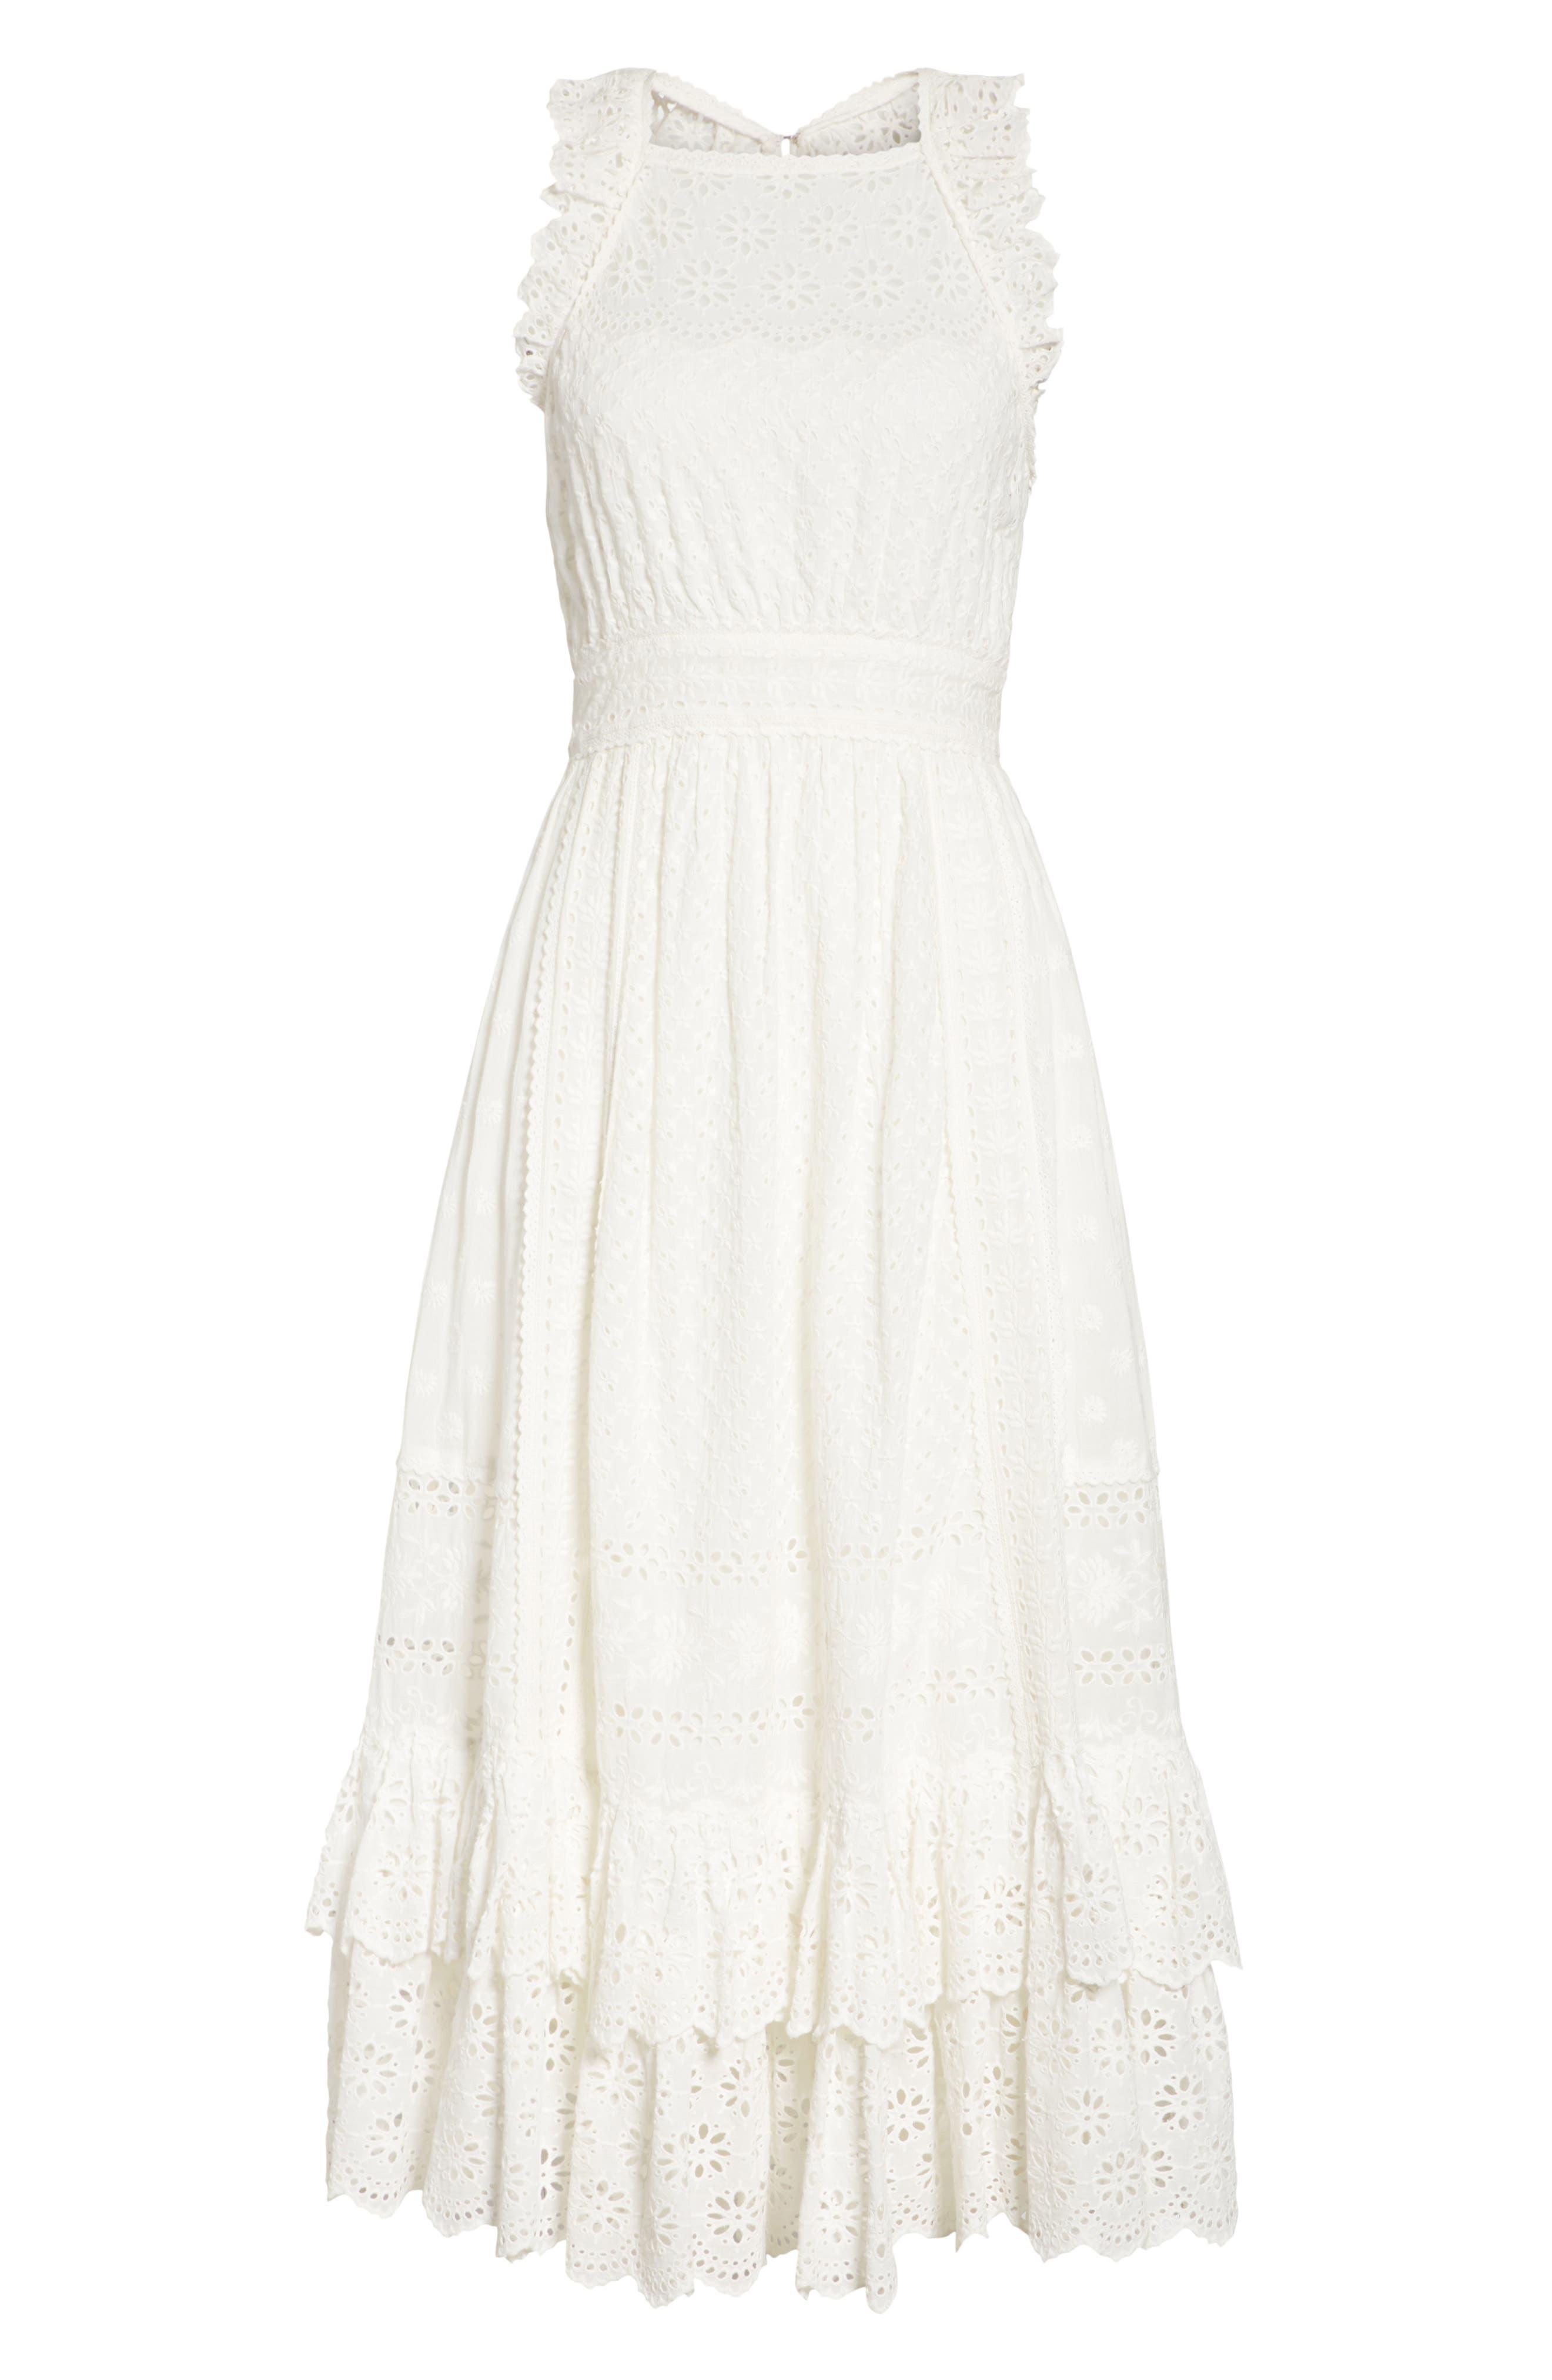 Willow Eyelet Dress,                             Alternate thumbnail 6, color,                             Blanc